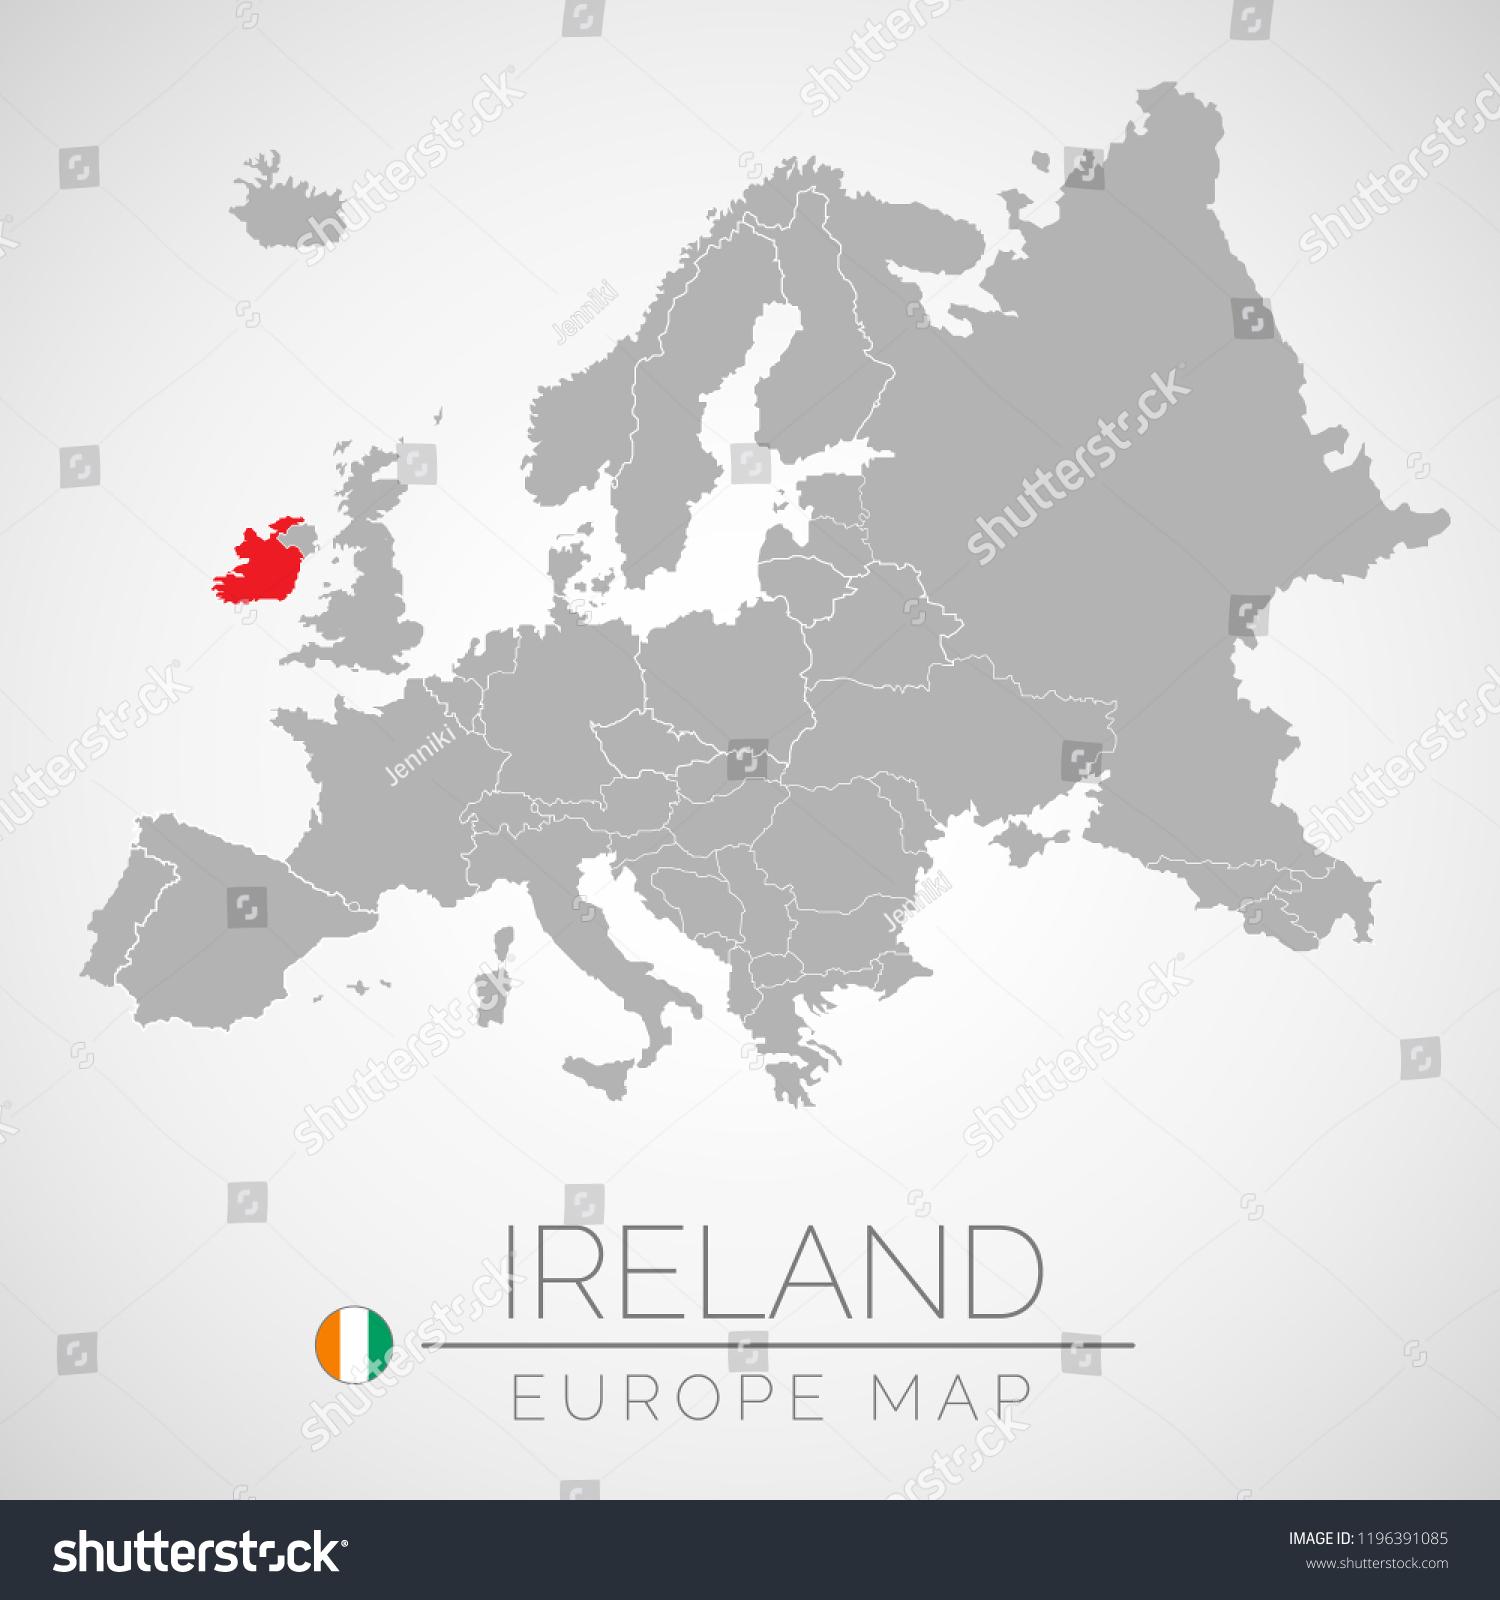 Ireland Map Of Europe.Map European Union Identication Ireland Map Stock Vector Royalty